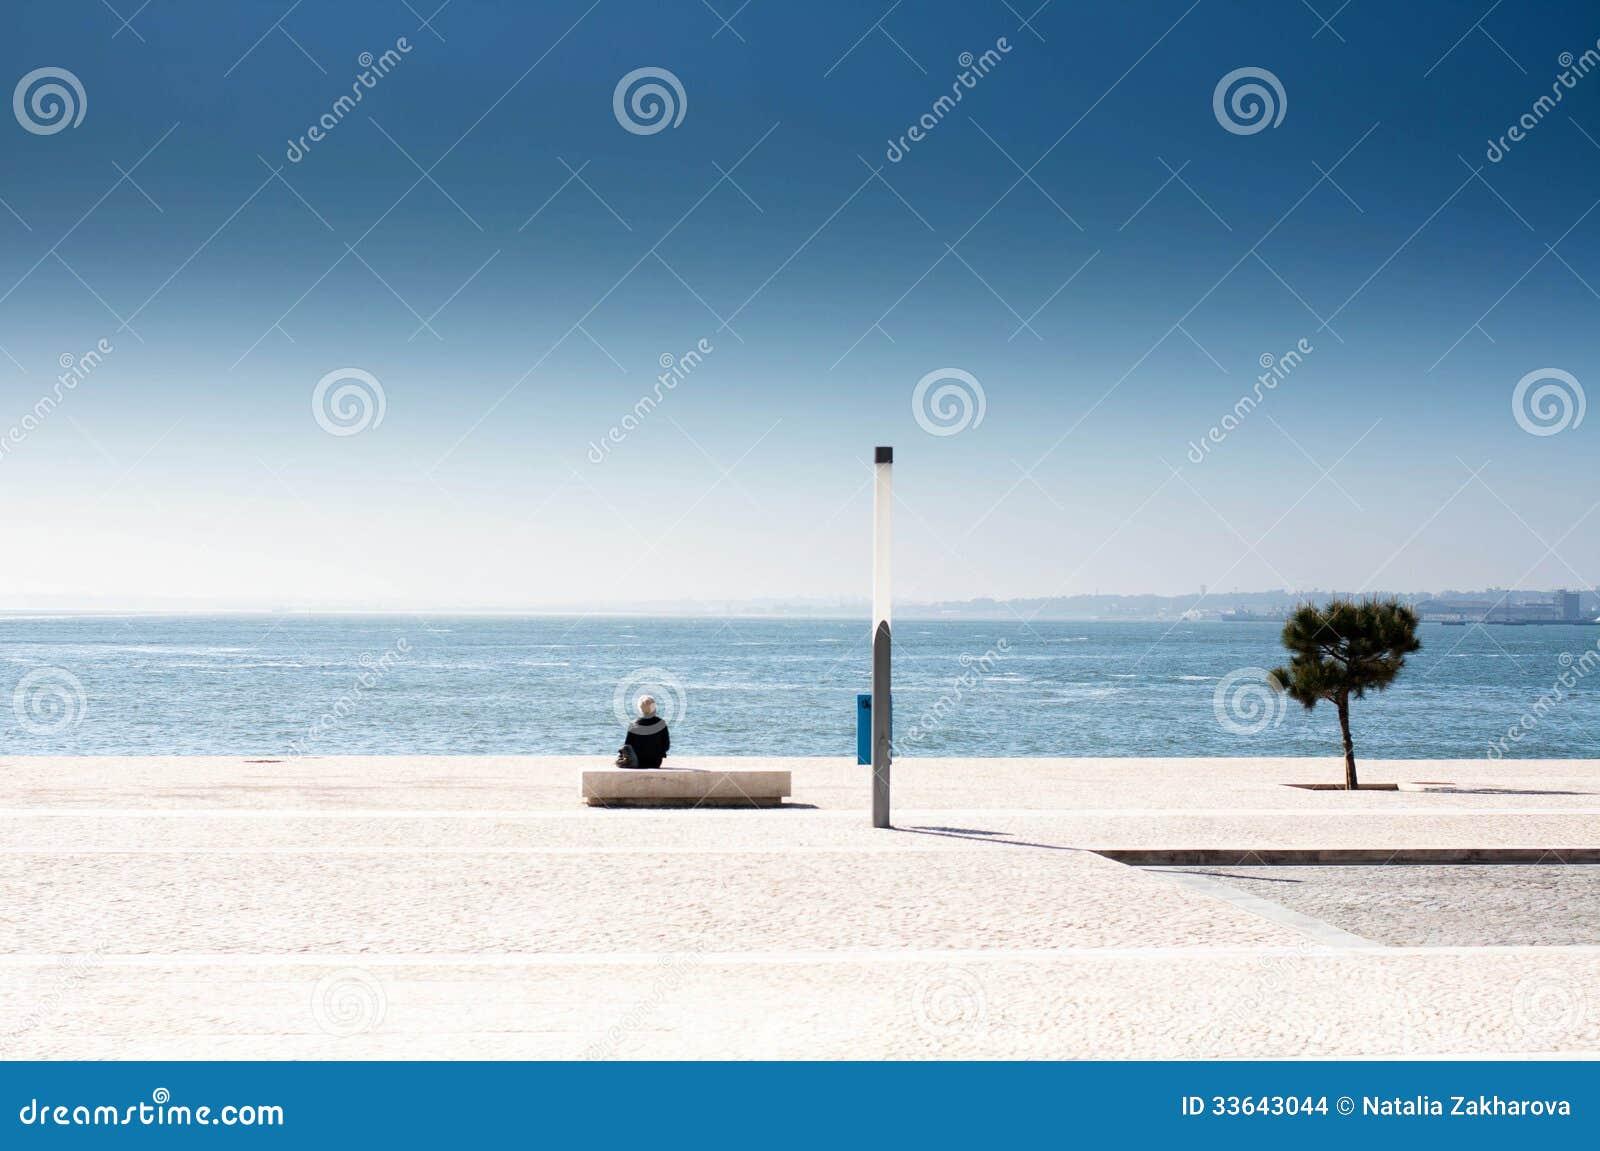 Hombre Solo En El Mar Mulher Procura Sexo Ananindeua-92216